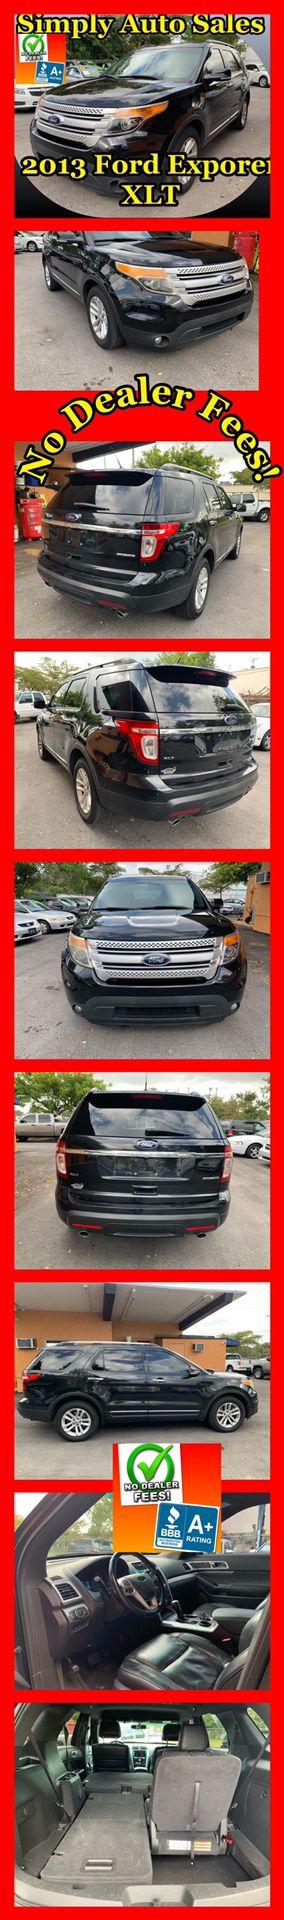 2013 Ford Explorer XLT for Sale in Palm Beach Gardens, FL